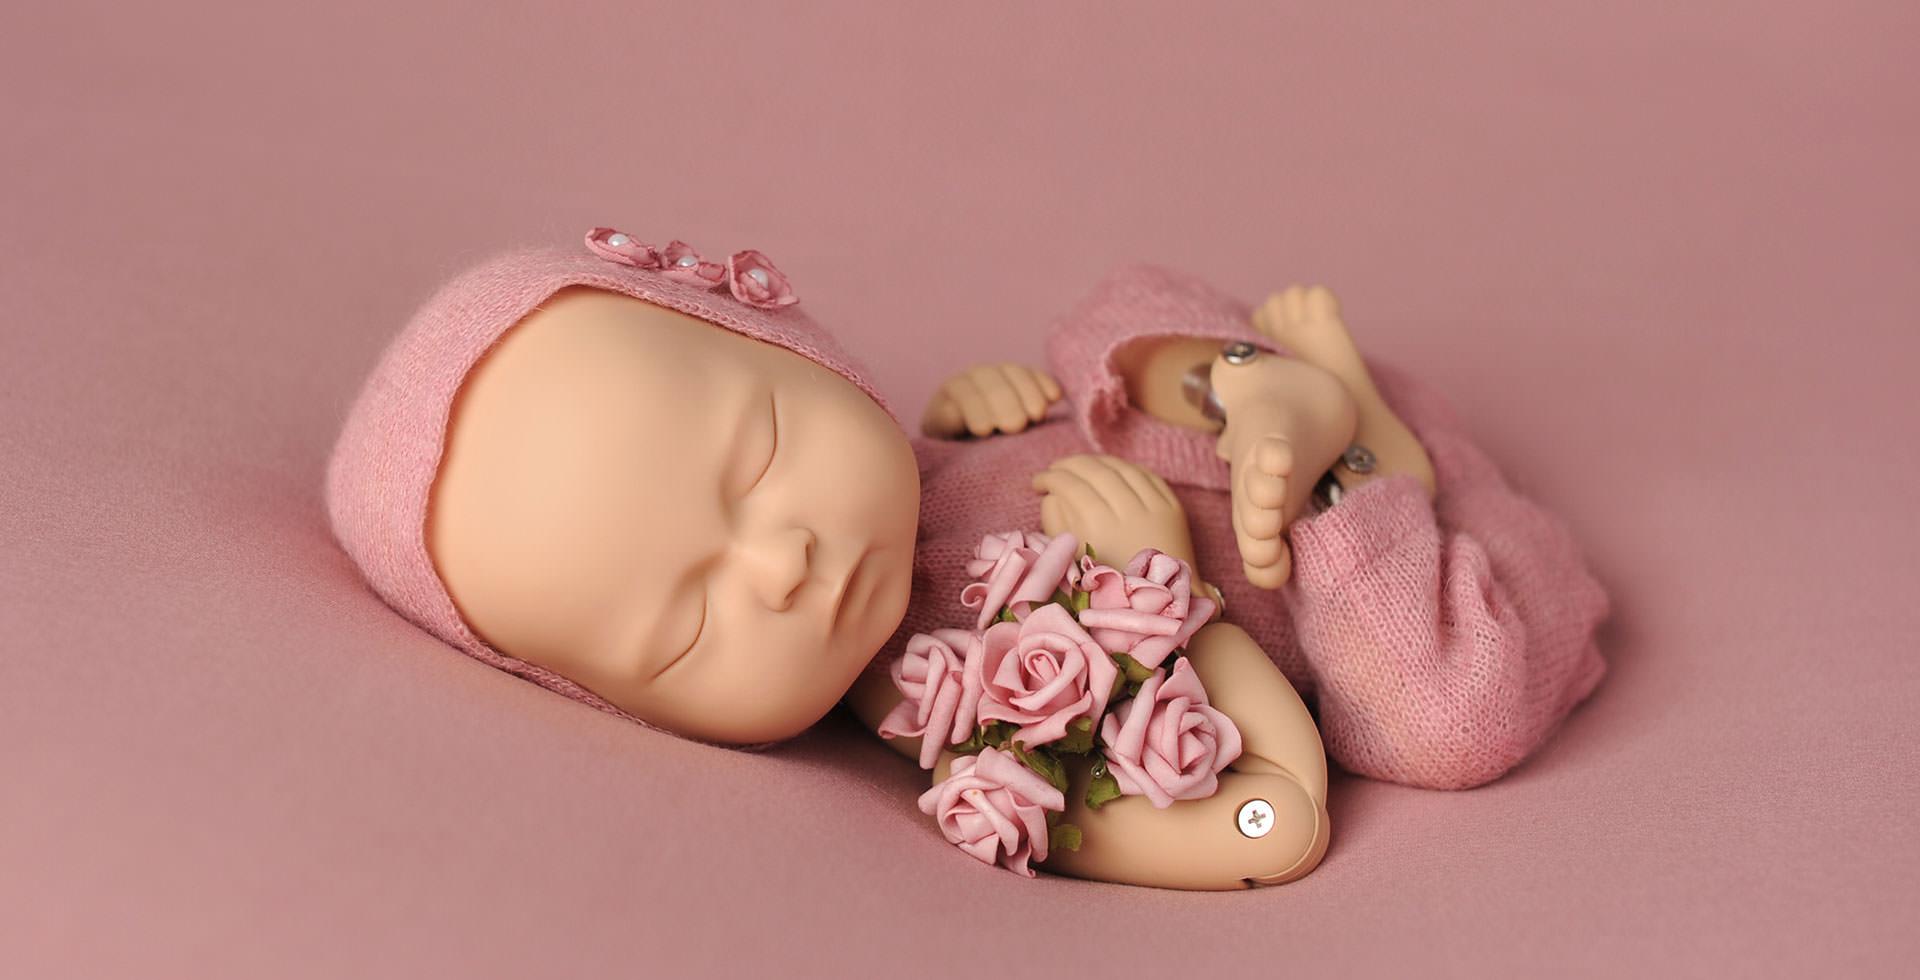 Newborn photography posing and training doll